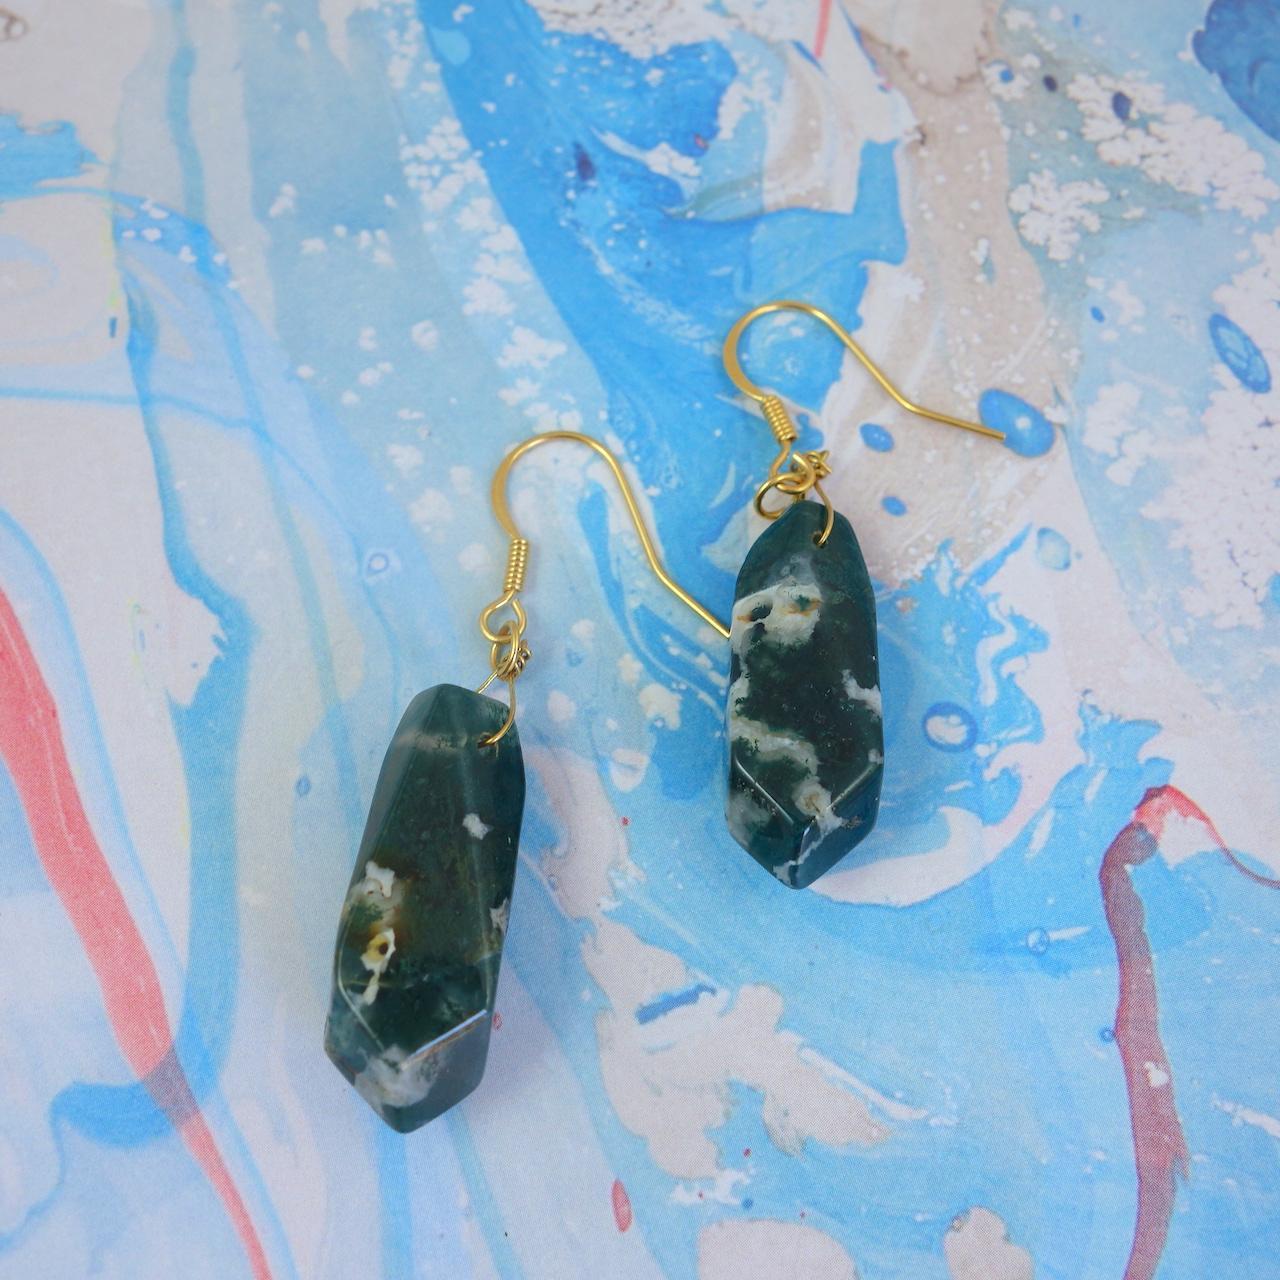 Boucles-oreille-Bettina-Roulotte-pierre-precieuse-malachite.dormeuse-dore-or-fin